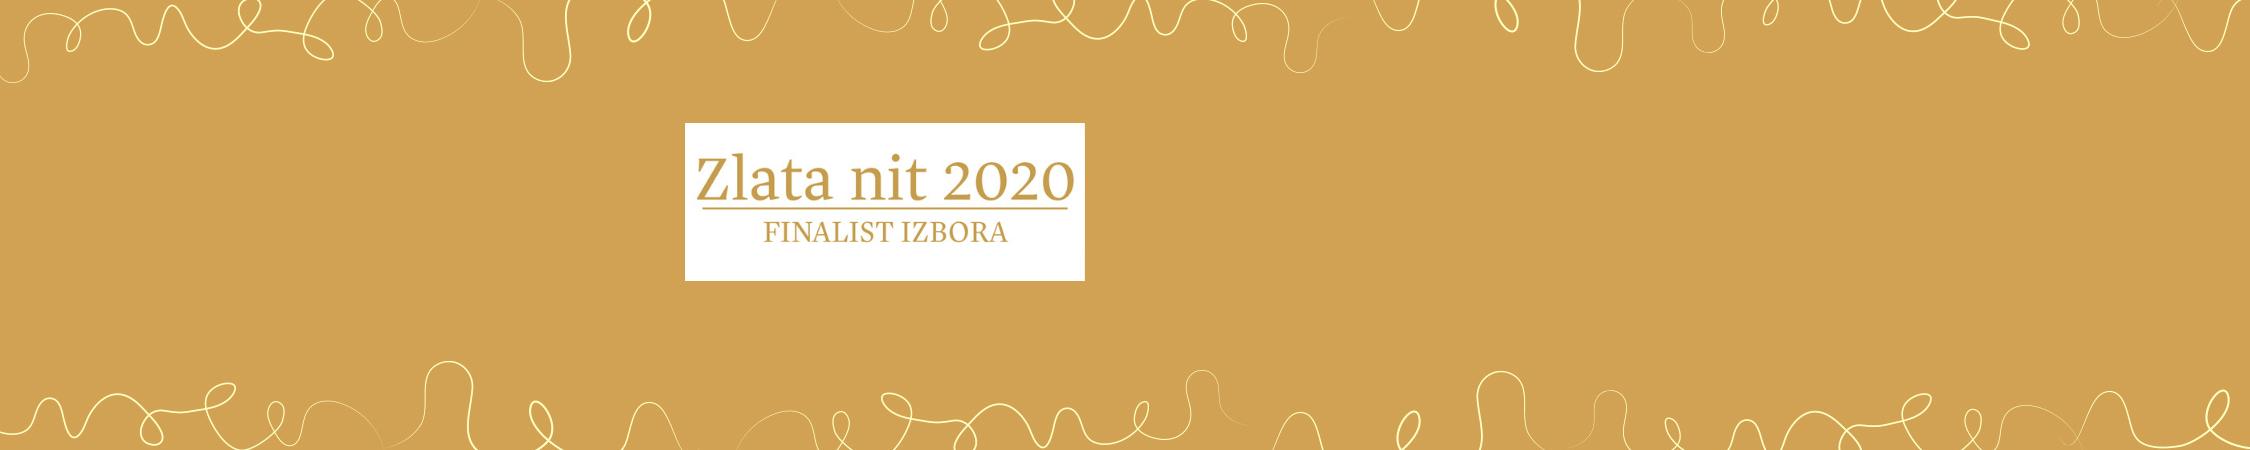 Zlata nit 2020 finalists